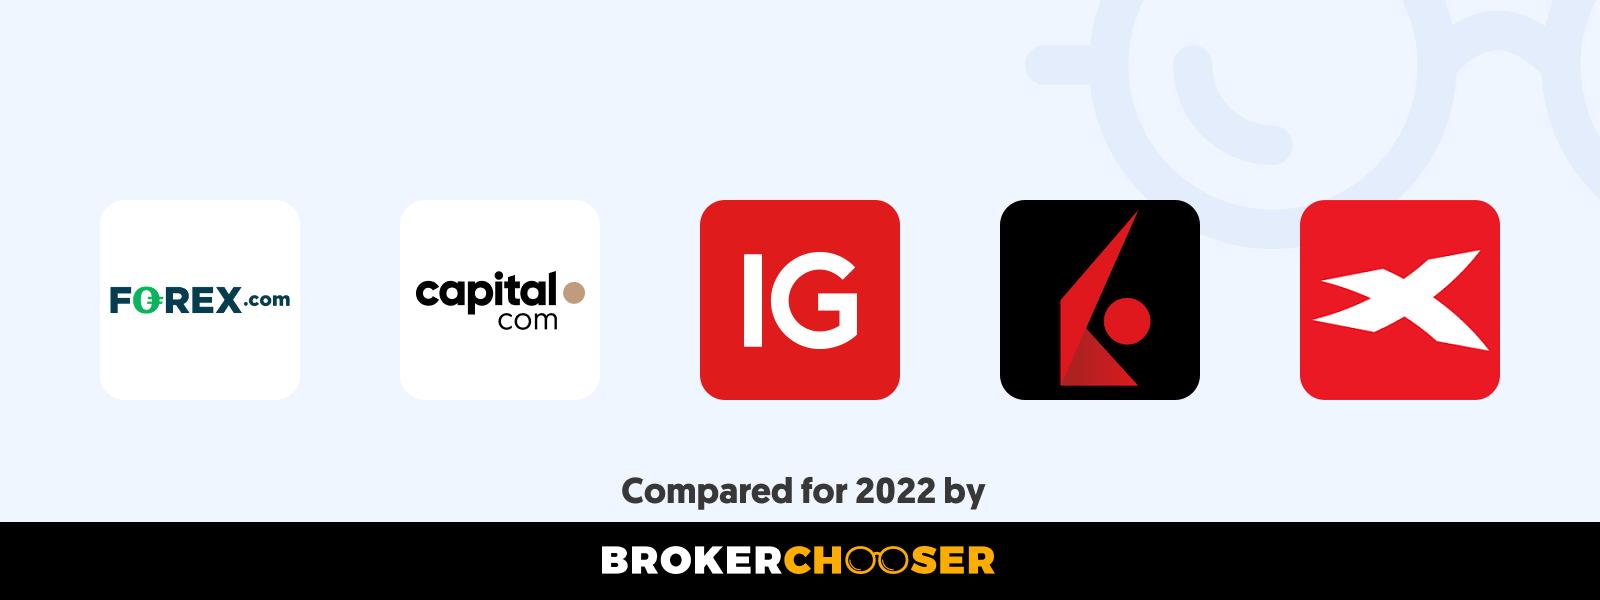 Best forex brokers for beginners in Cape Verde in 2021